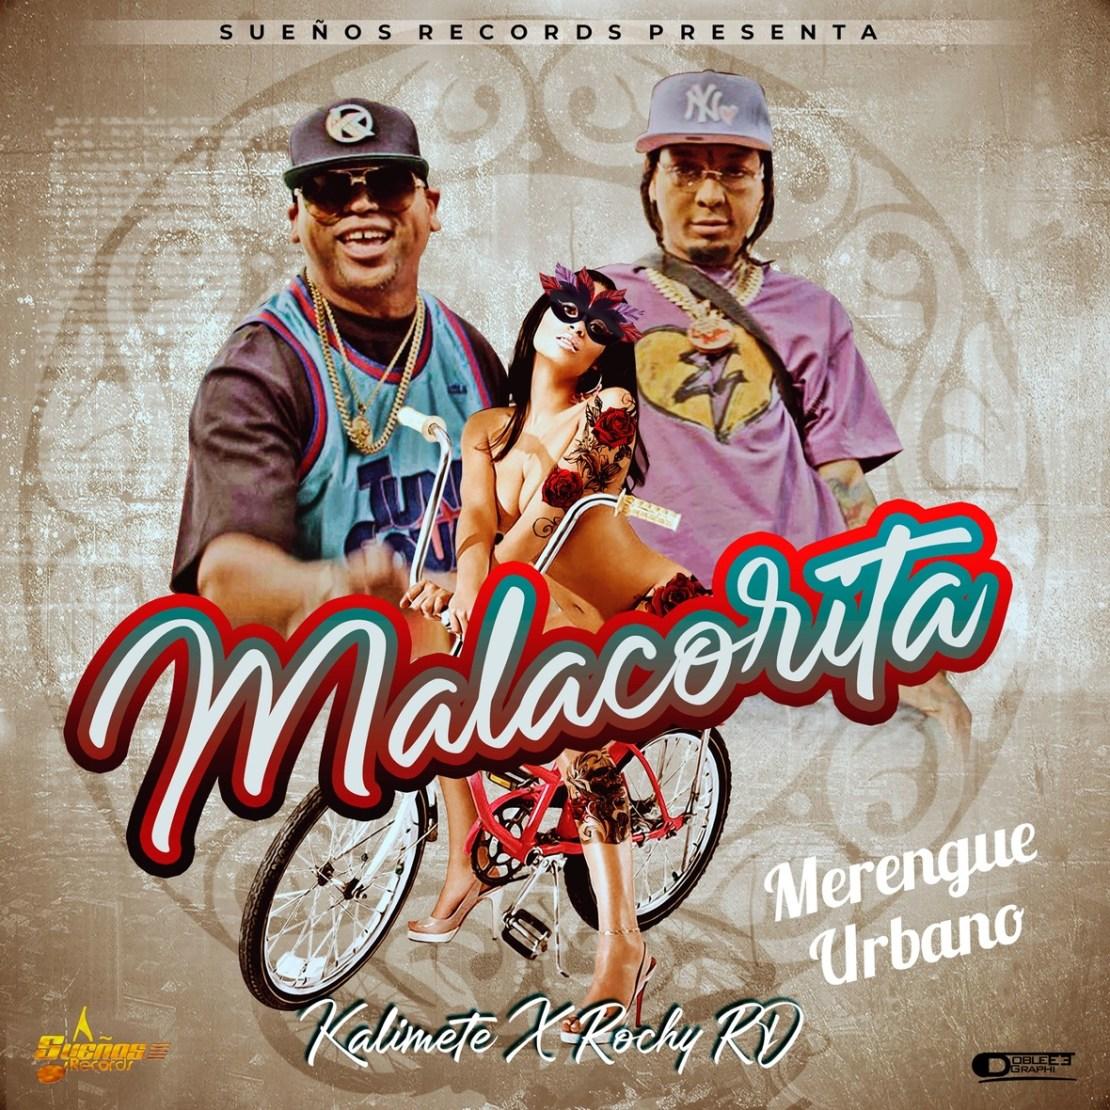 Malacorita Cover